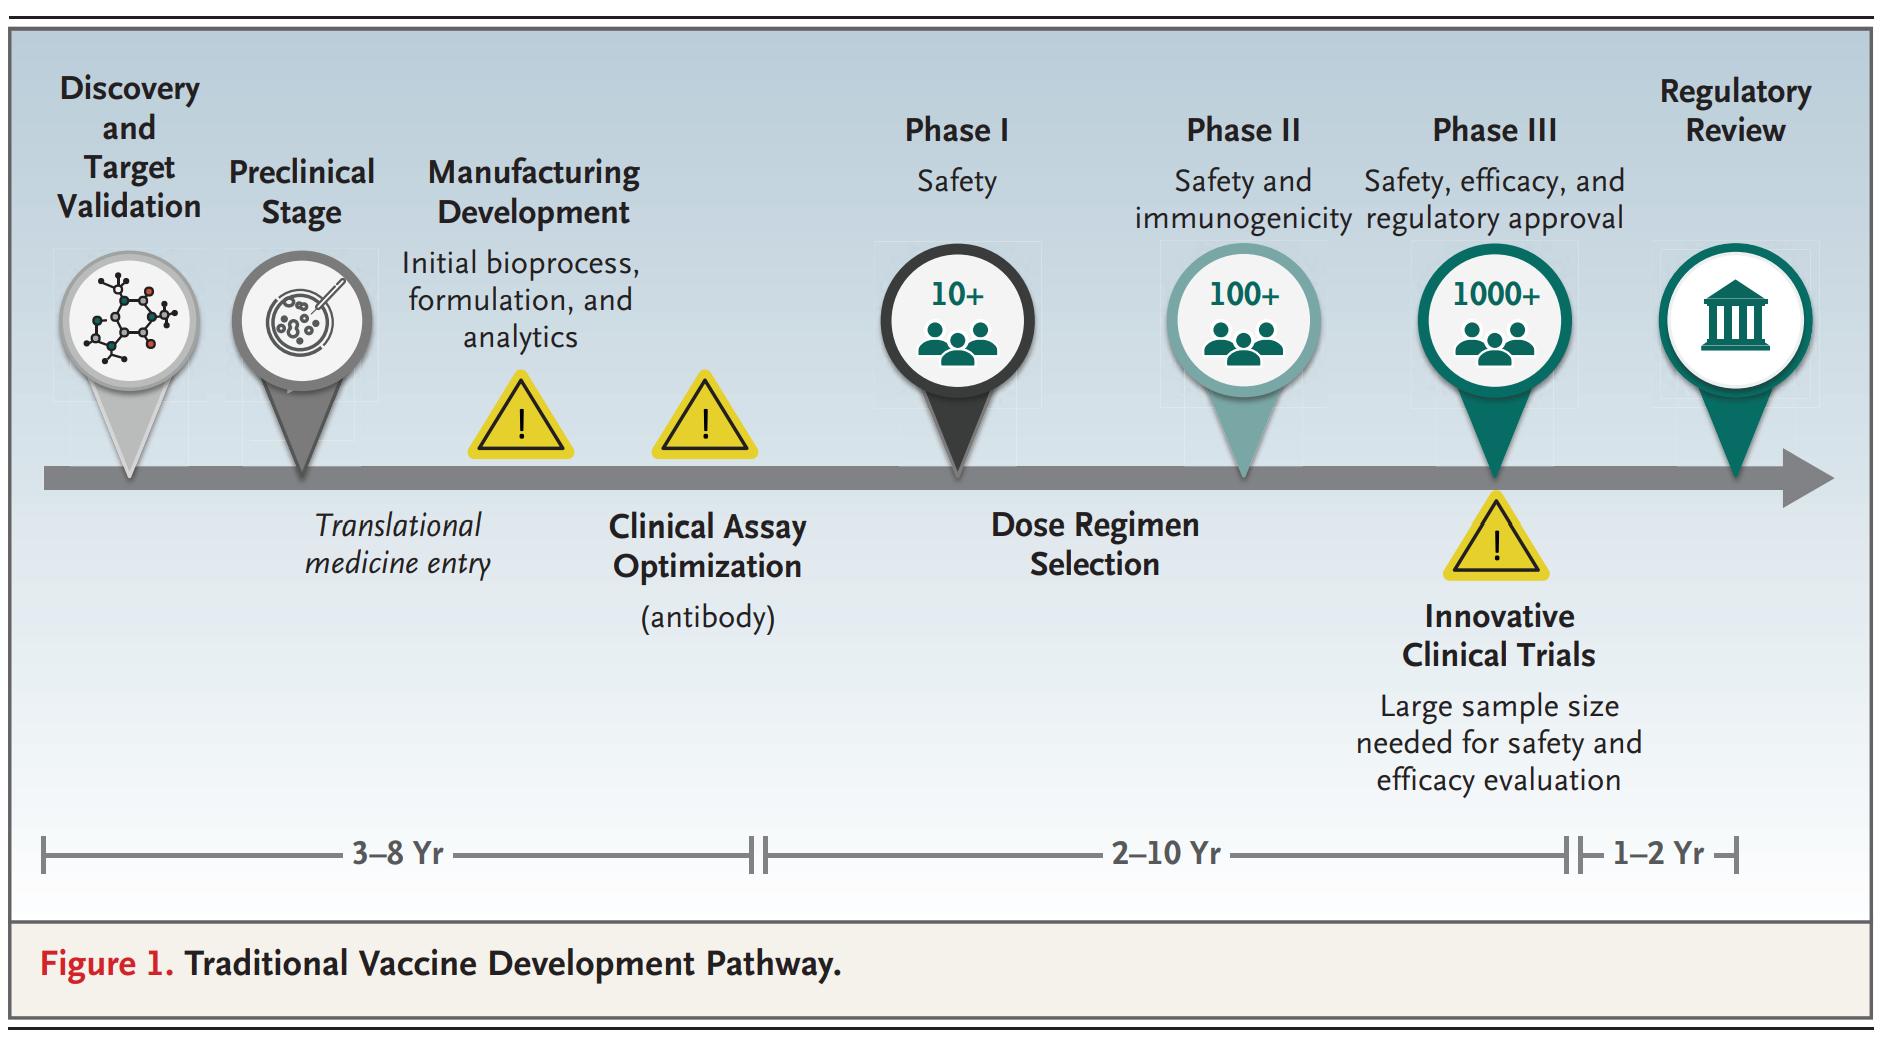 https://smart119.biz/covid-19/images/covid-19%20vaccine-development%20multiverse%20figure1.png